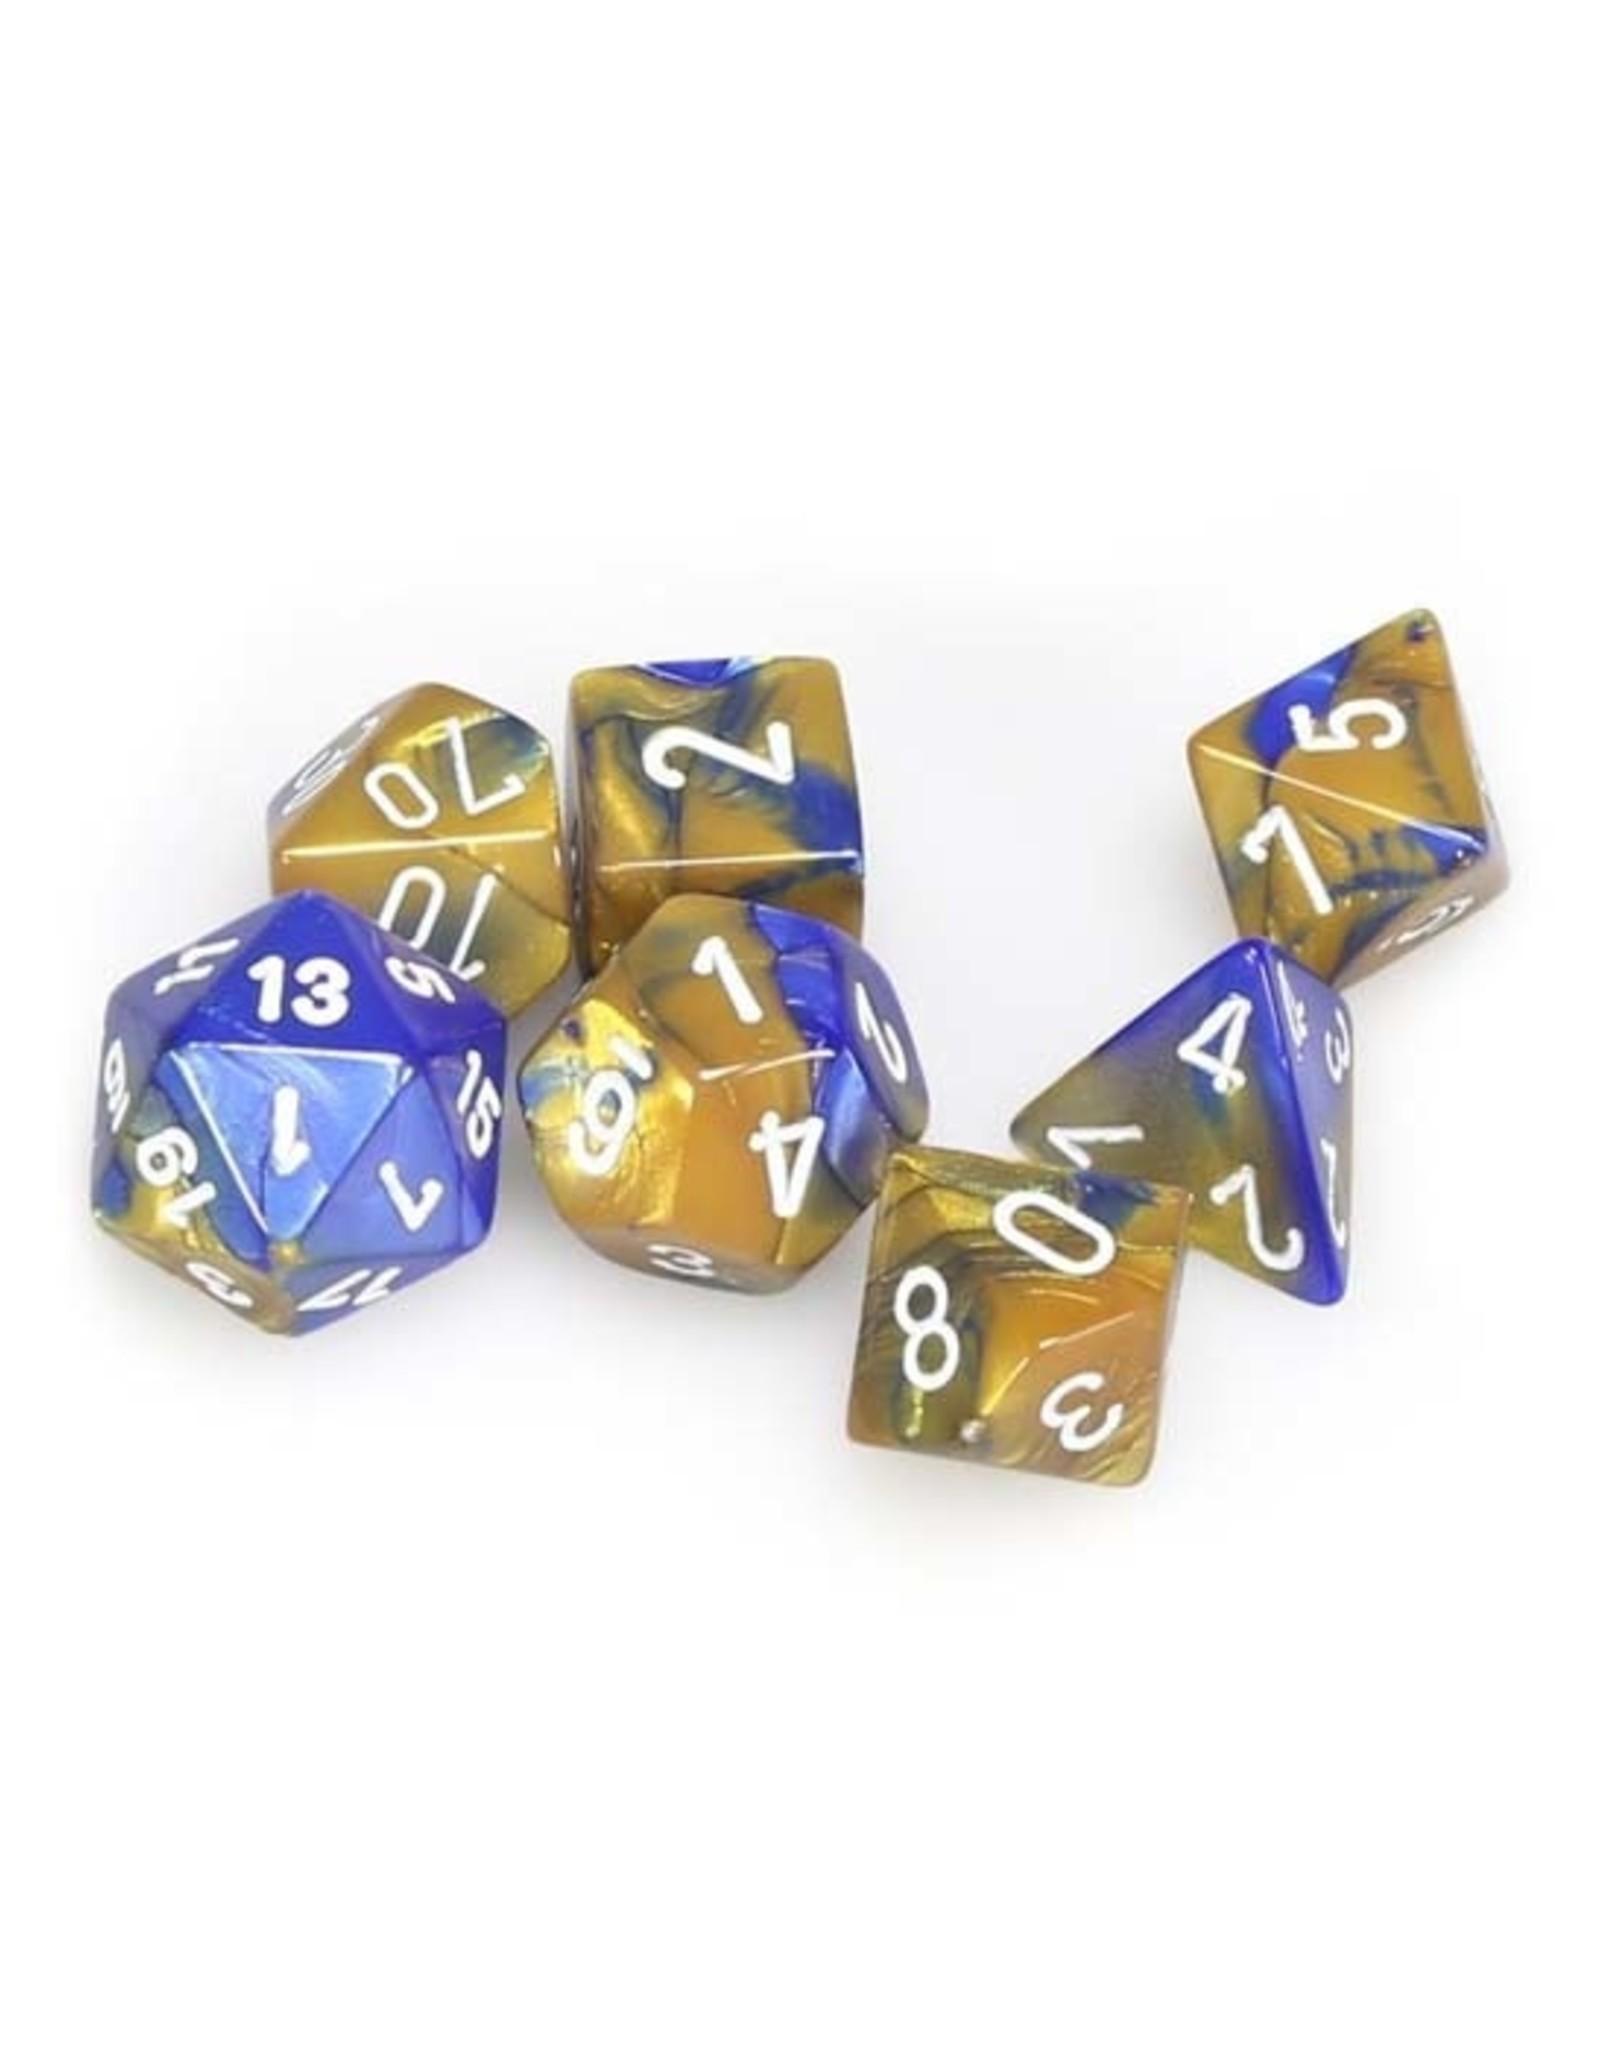 Chessex Chessex: Poly 7 Set - Gemini - Blue-Gold w/ White